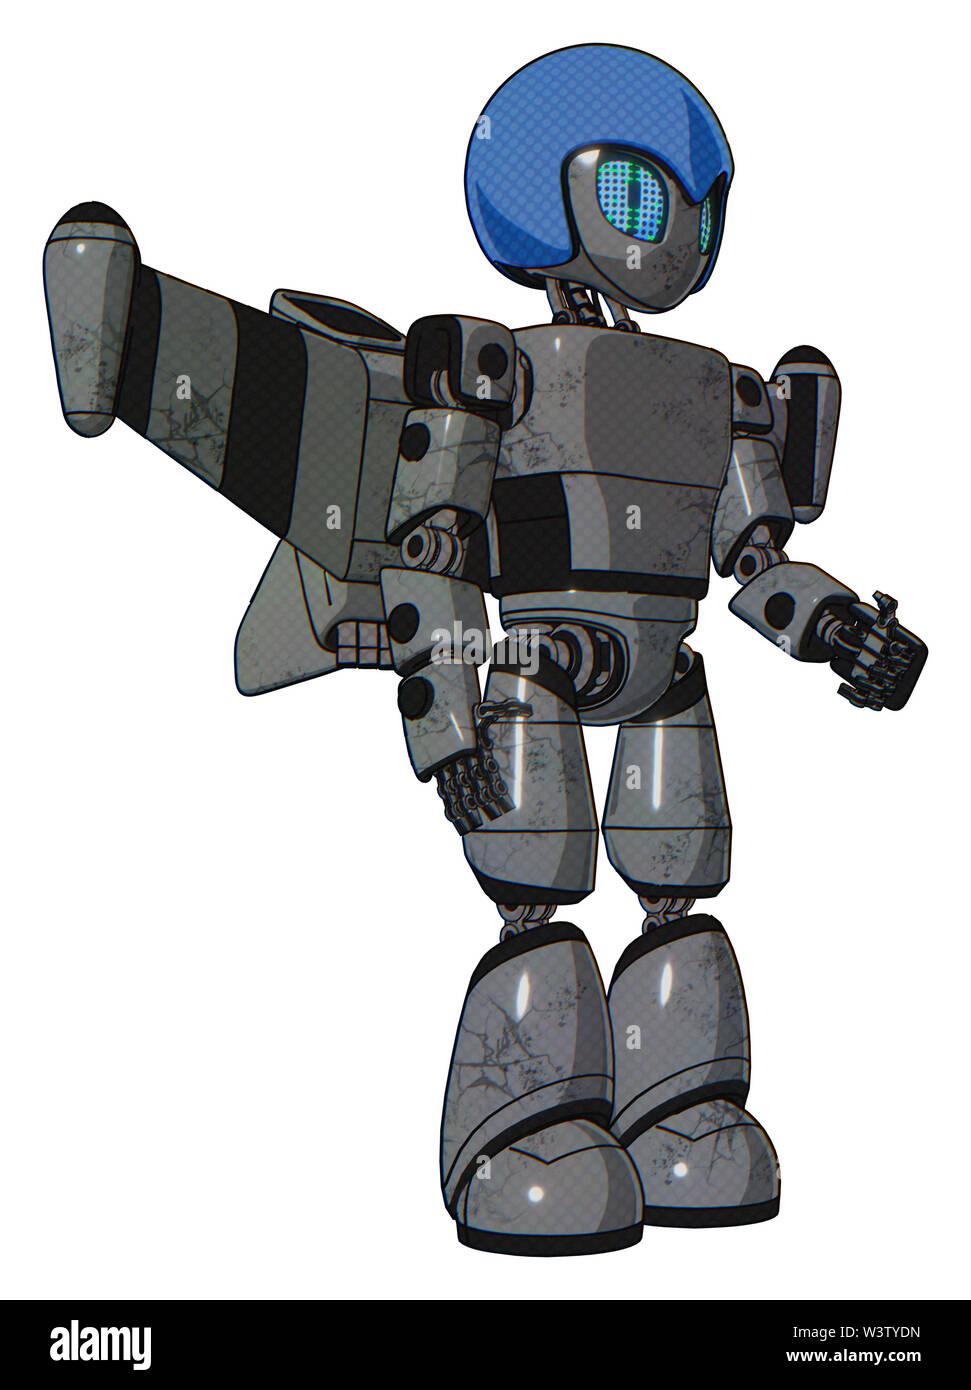 Automaton containing elements: grey alien style head, blue grate eyes, blue helmet, light chest exoshielding, prototype exoplate chest, stellar jet wi - Stock Image